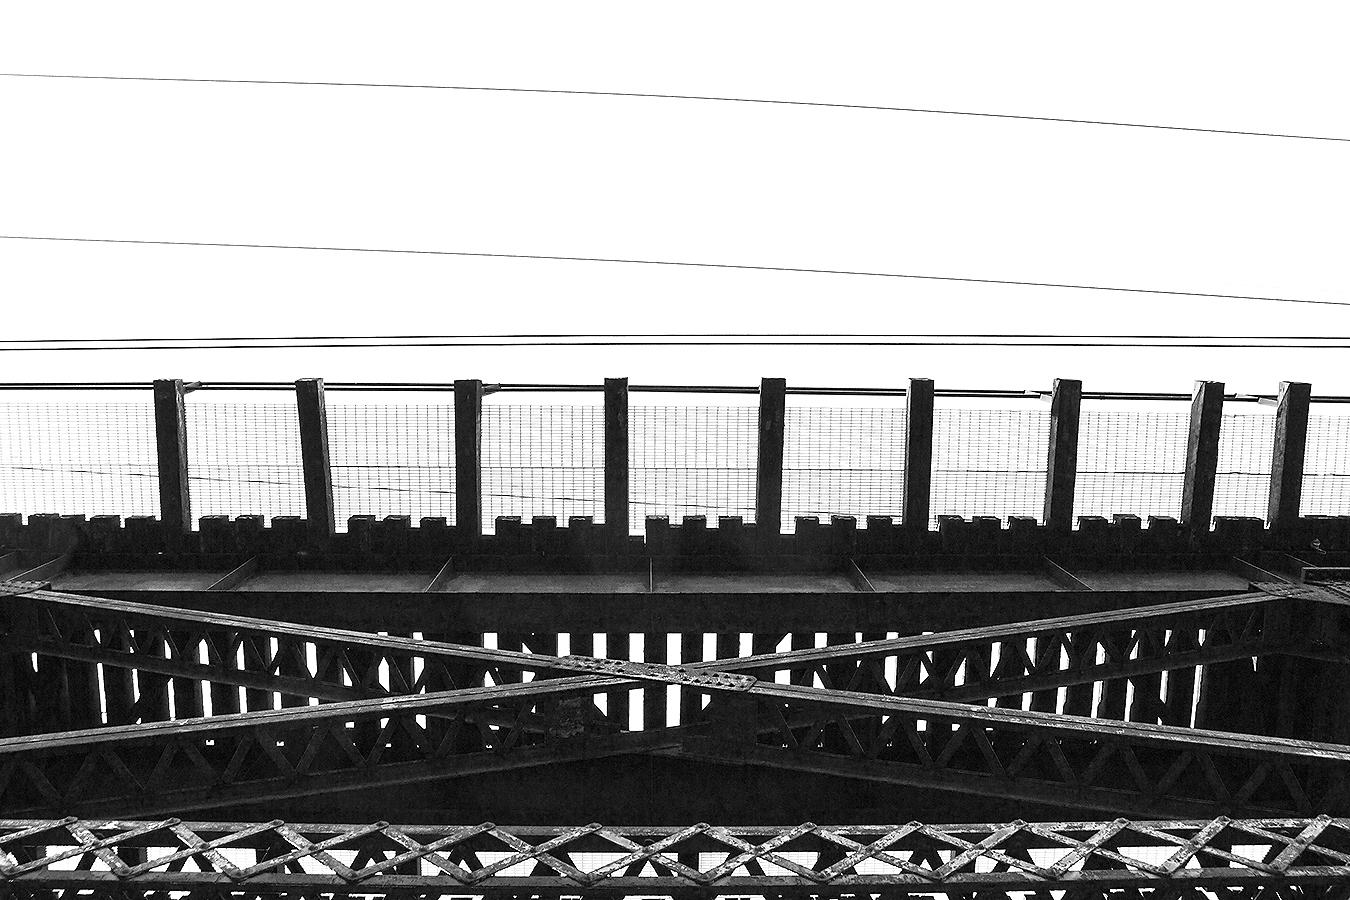 Janelle_Tong_Photography_Tony_Ward_Studio_Individual_Project_UPenn_Penn_Park_Bridges_Railroad_Tracks_Balance_Across_Sky